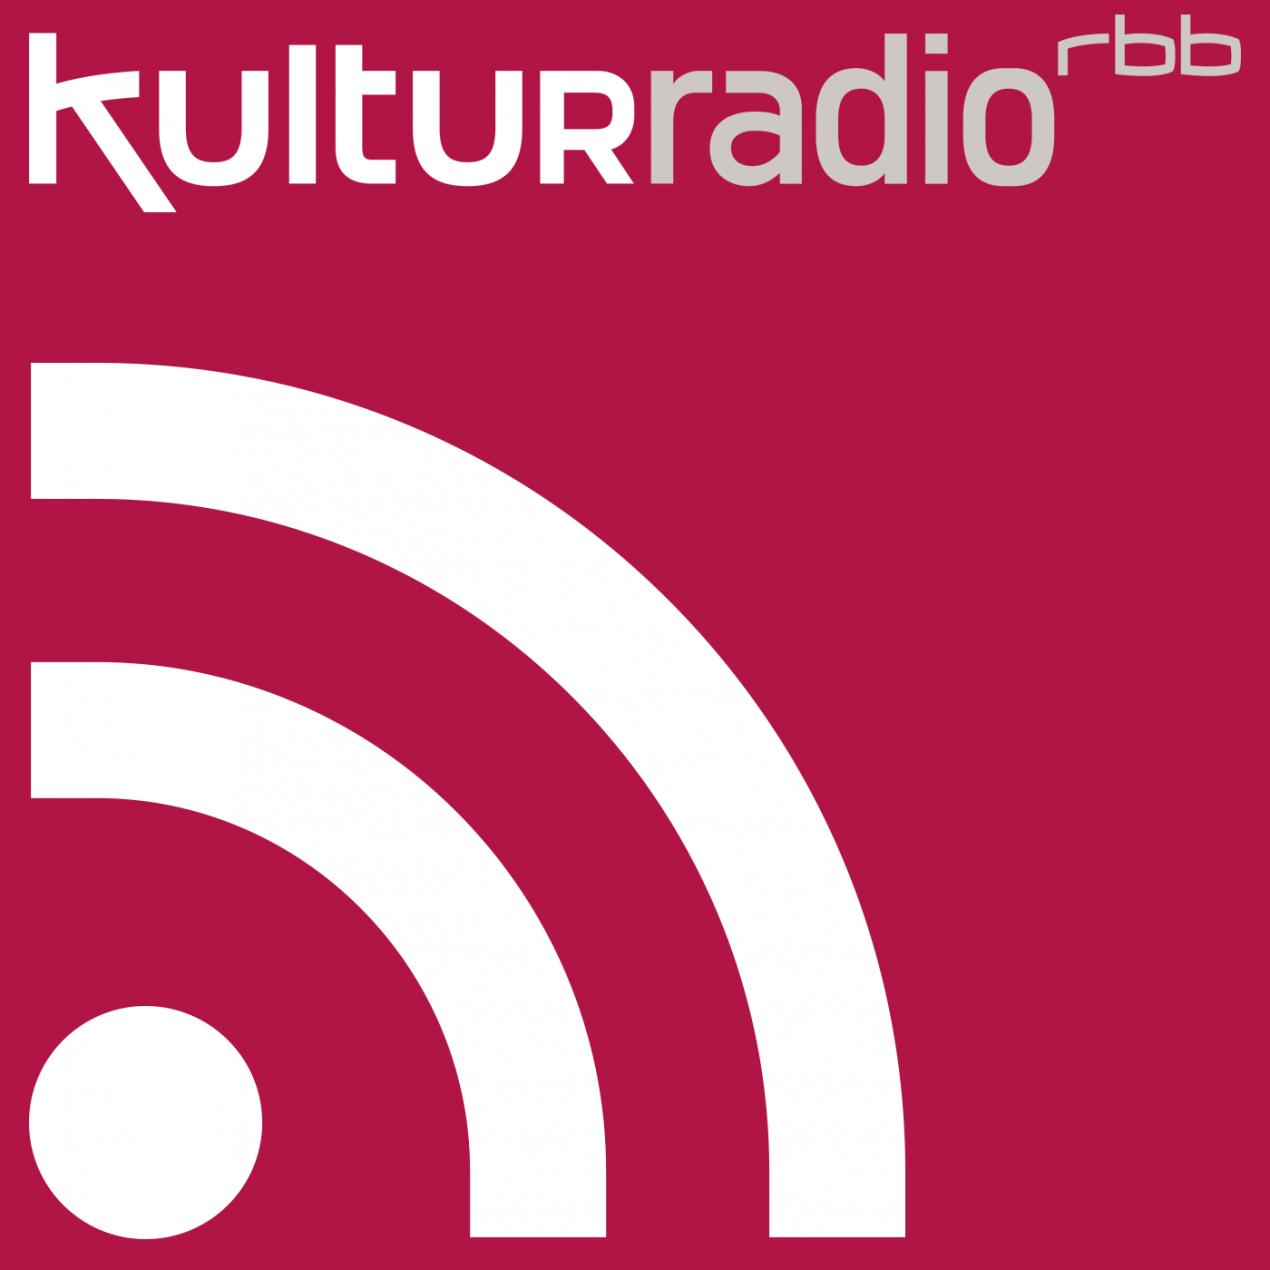 radio rbb live stream